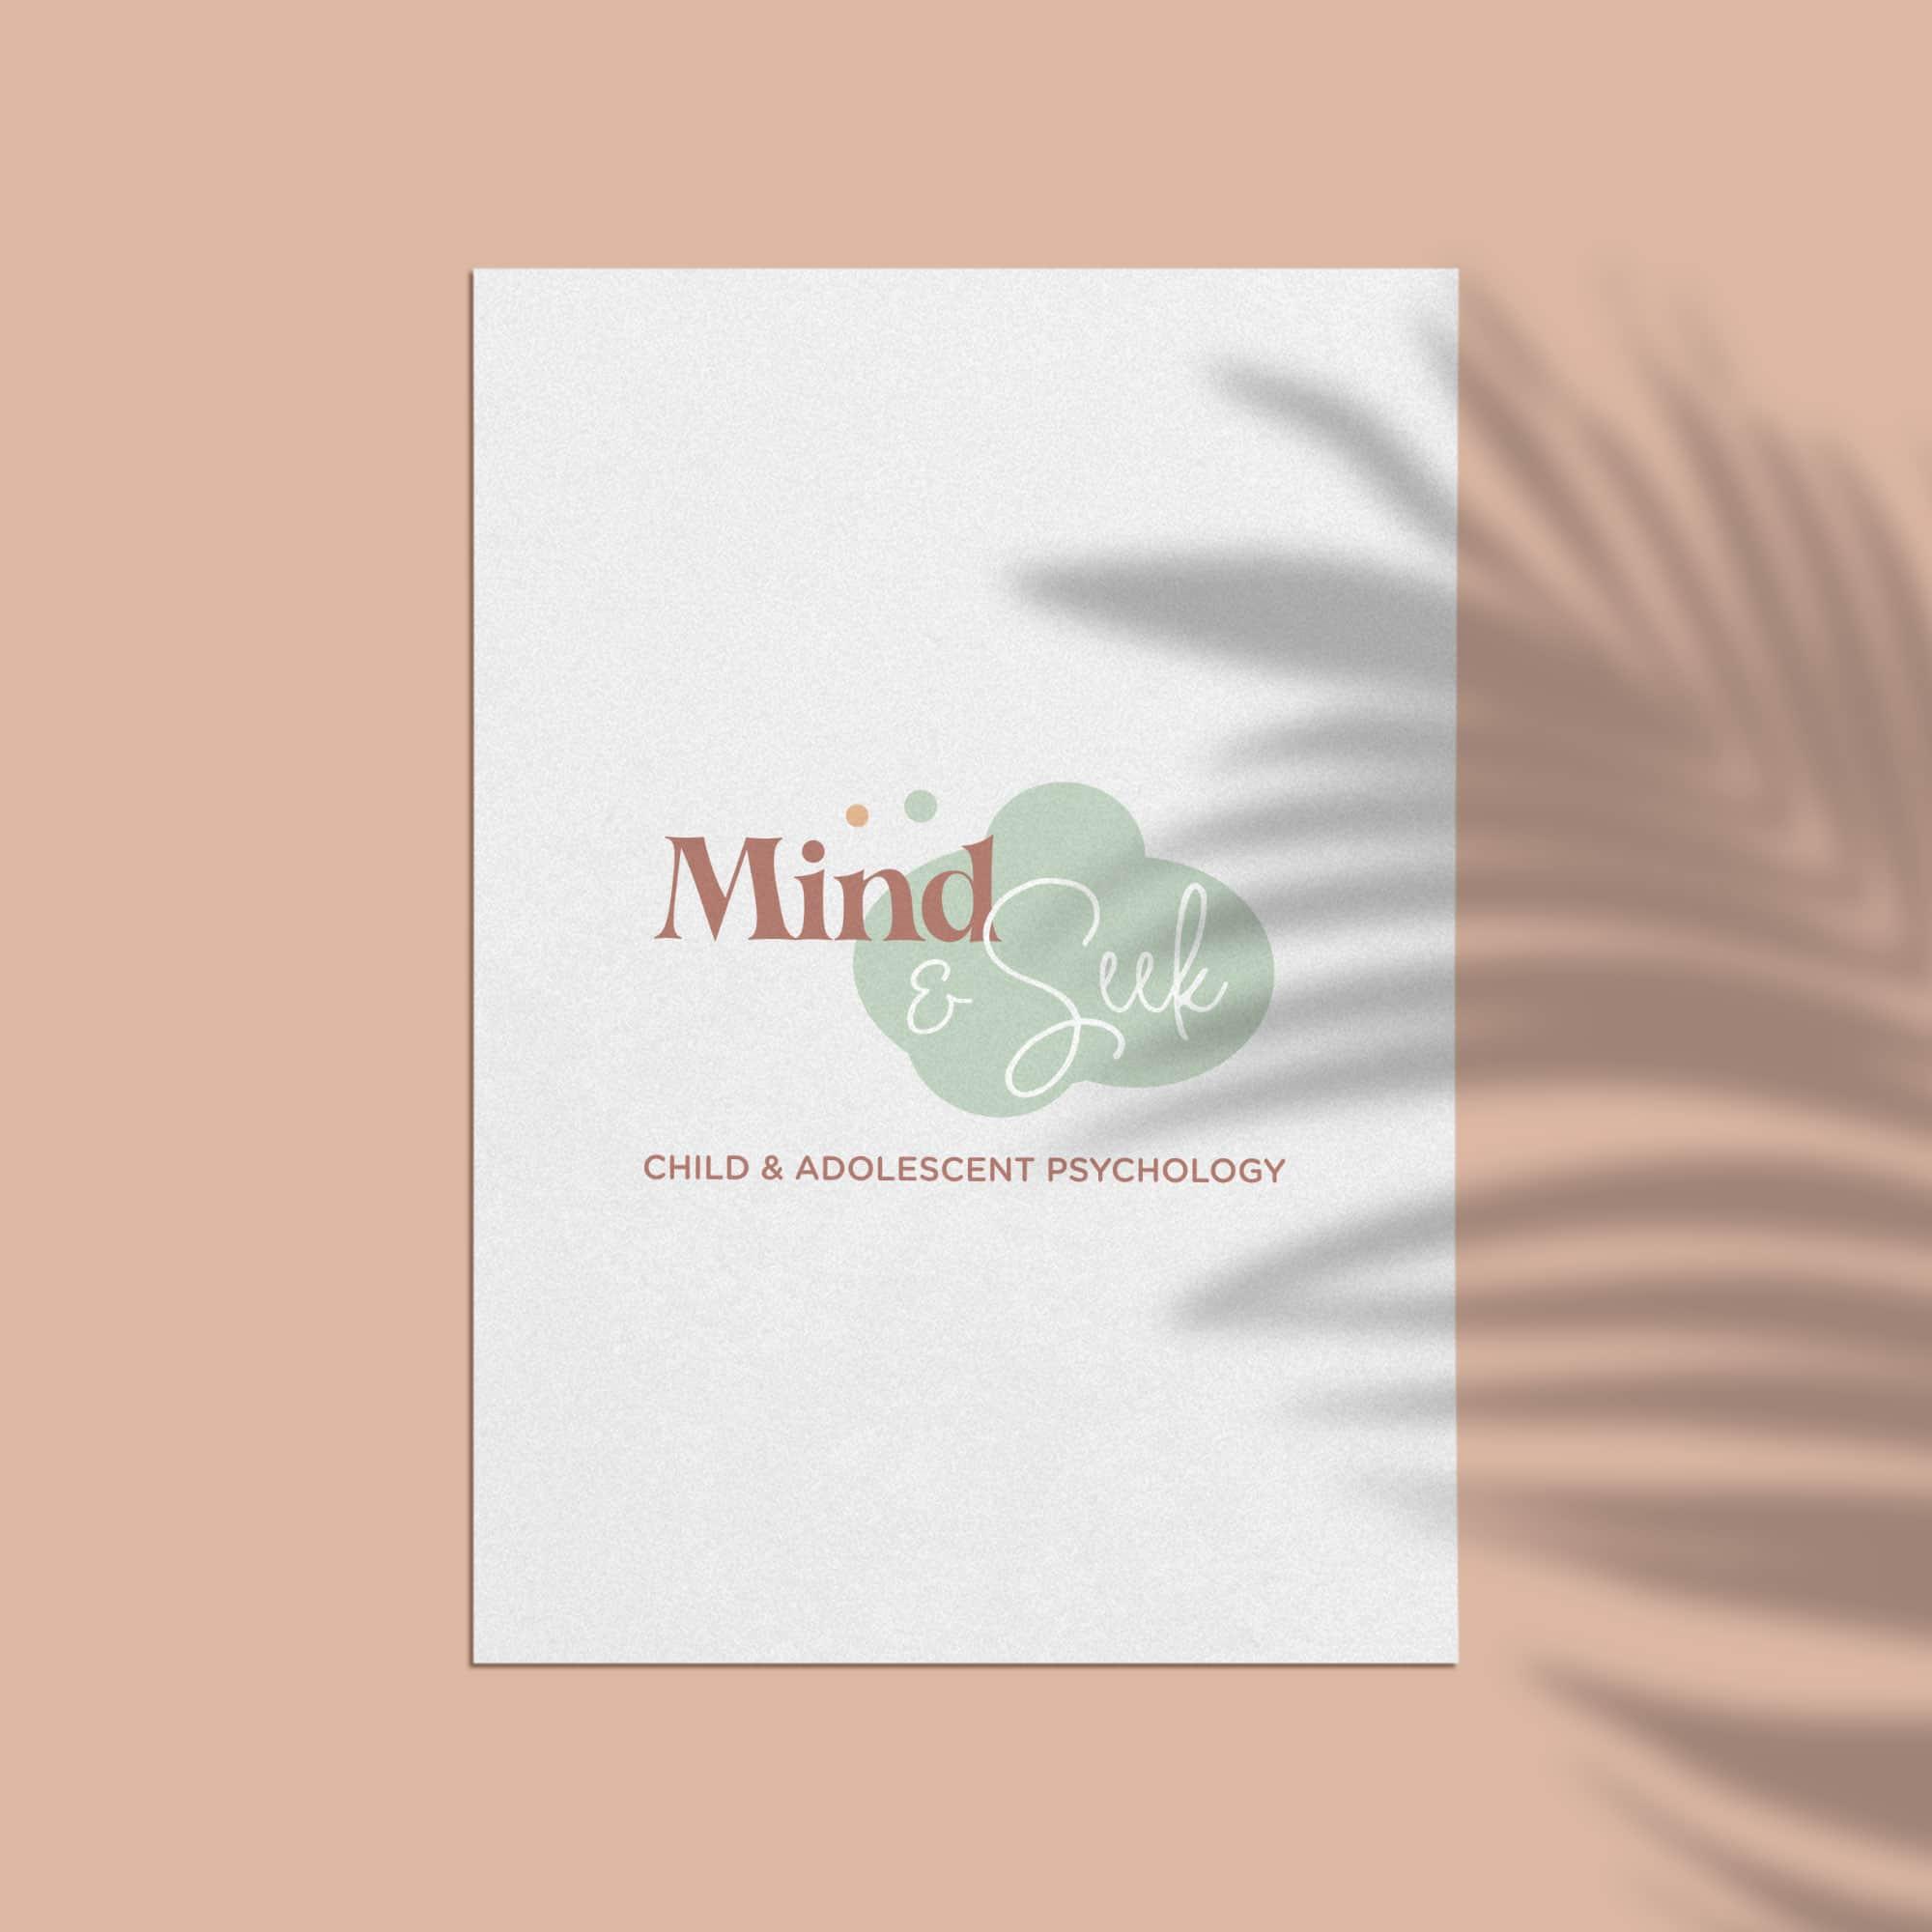 mind&seek promo1